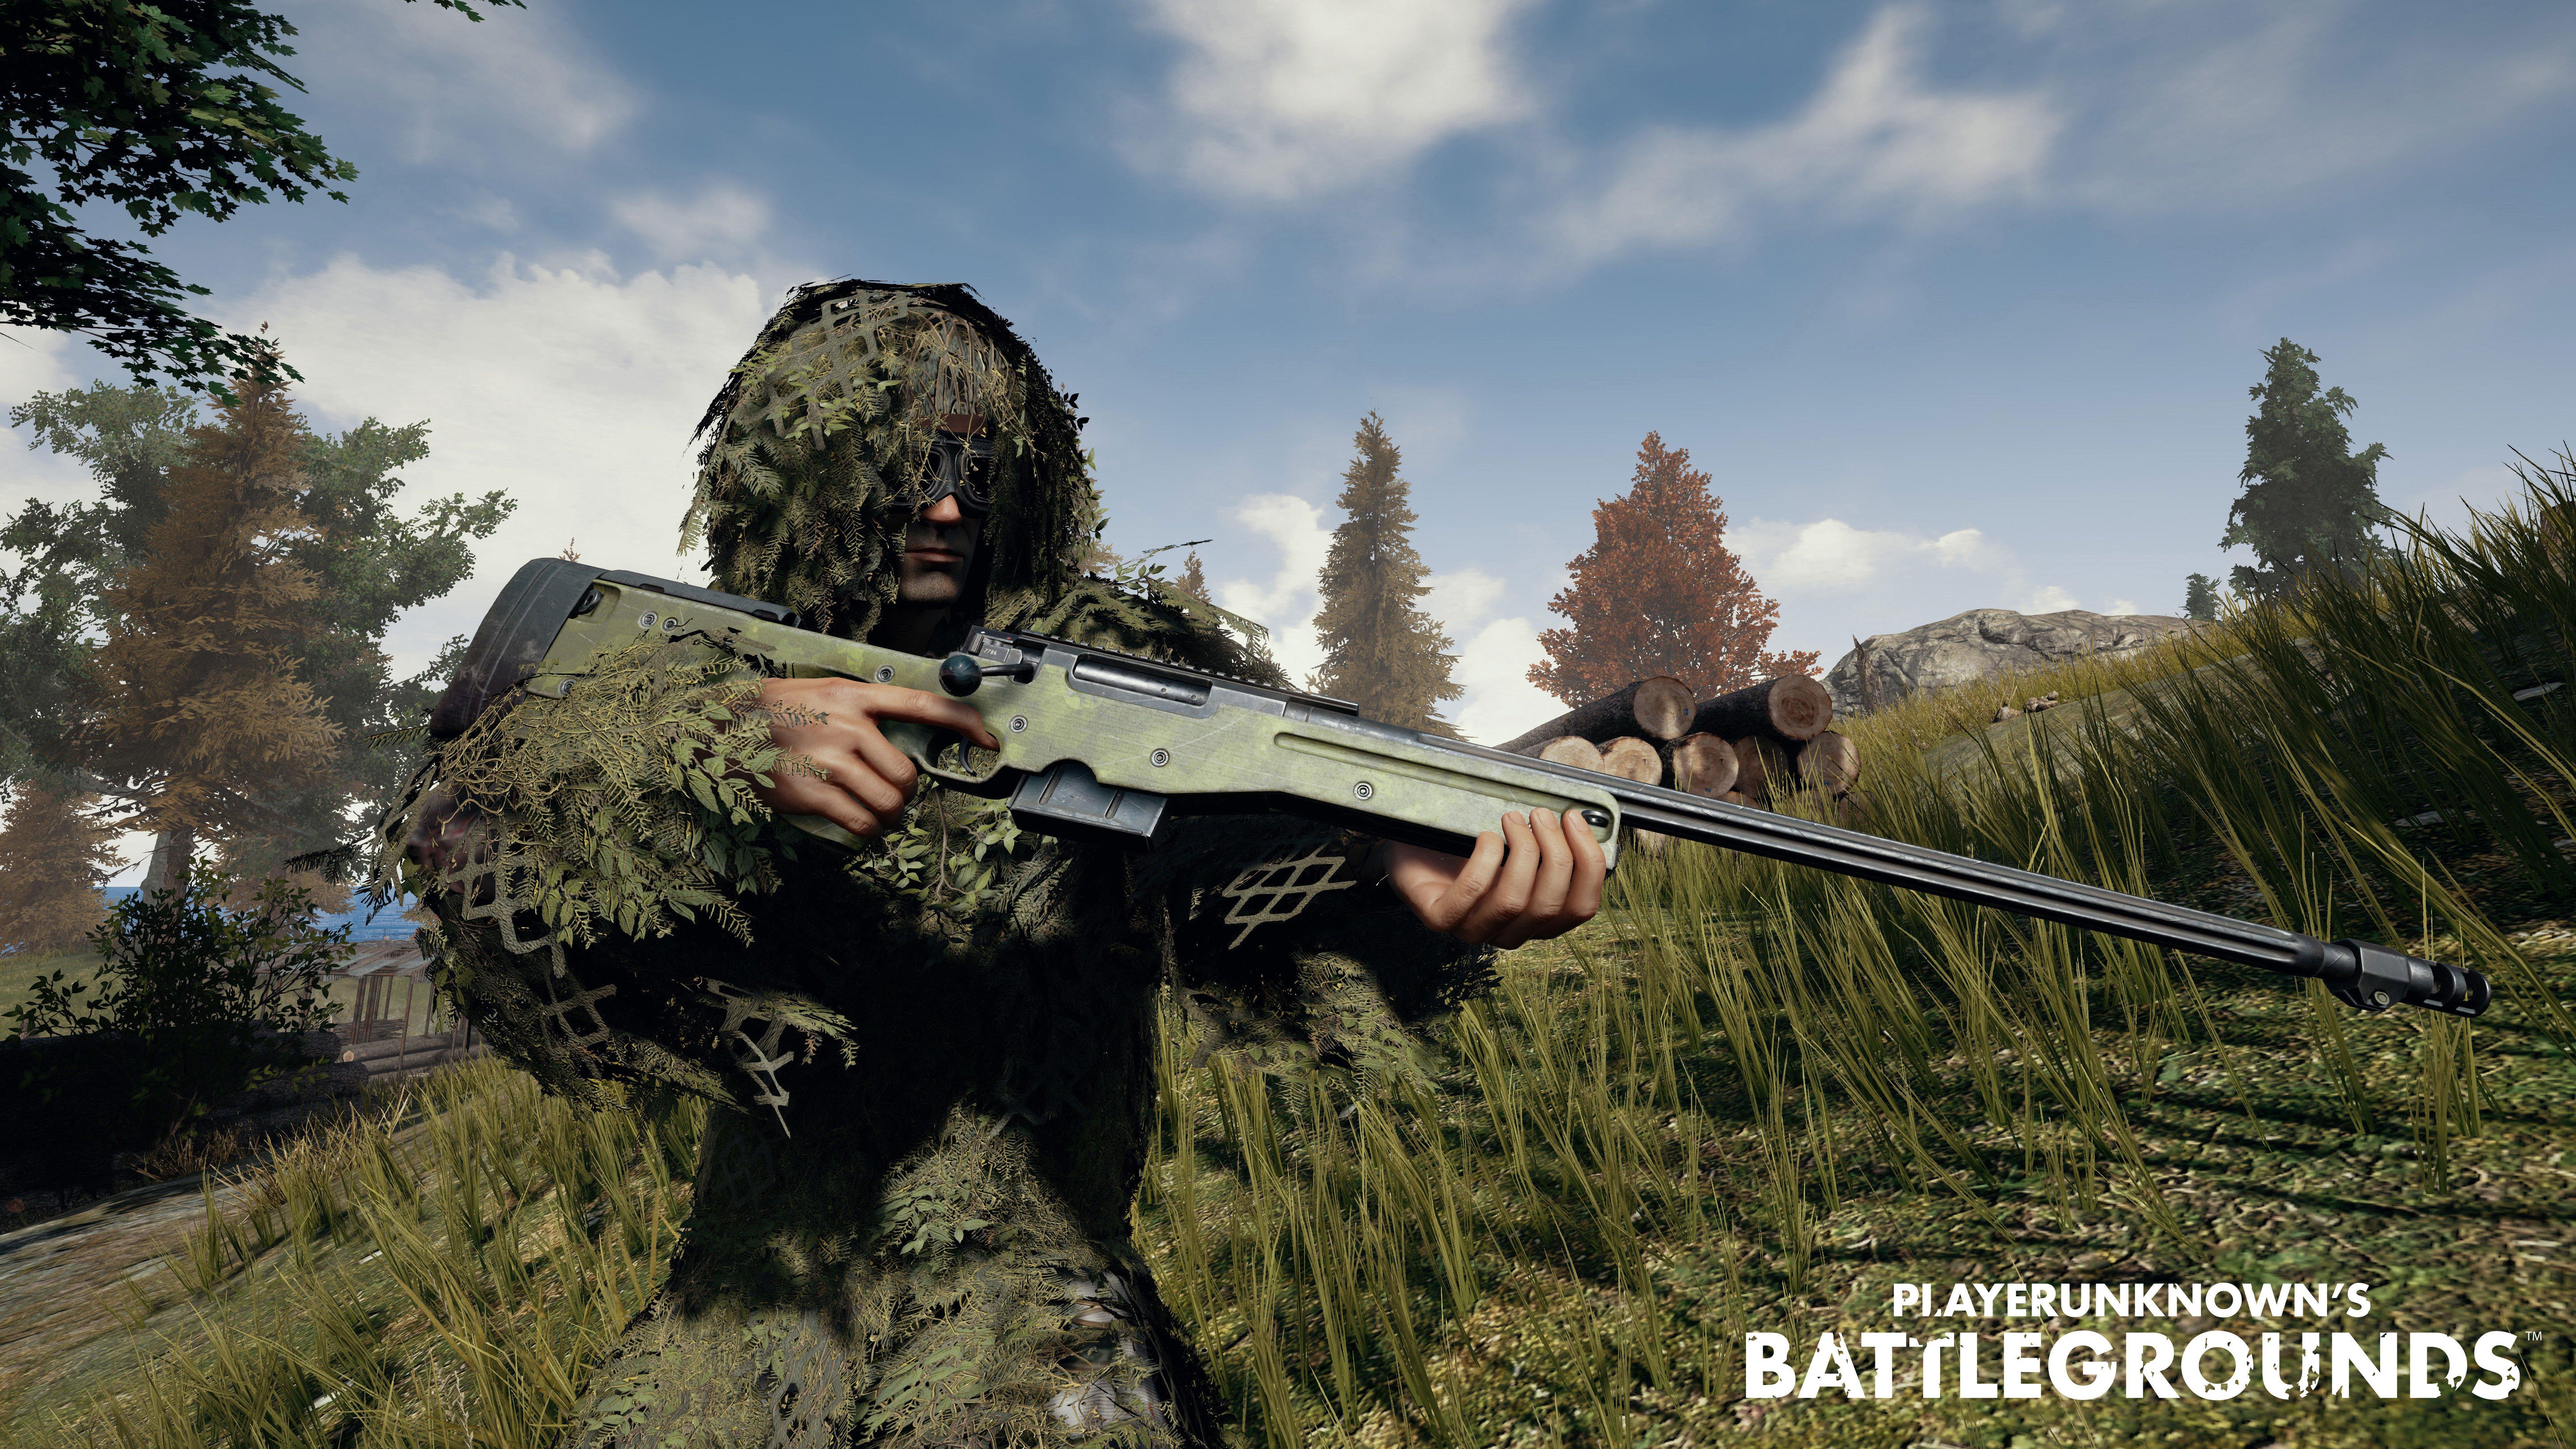 pubg sniper rifle camouflage playerunknown s battlegrounds 8k wallpaper 7680x4320 1544827997 - PUBG Sniper Rifle Camouflage PlayerUnknown's Battlegrounds 8K Wallpaper 7680x4320. - PlayerUnknown's Battlegrounds (PUBG) 4k wallpapers